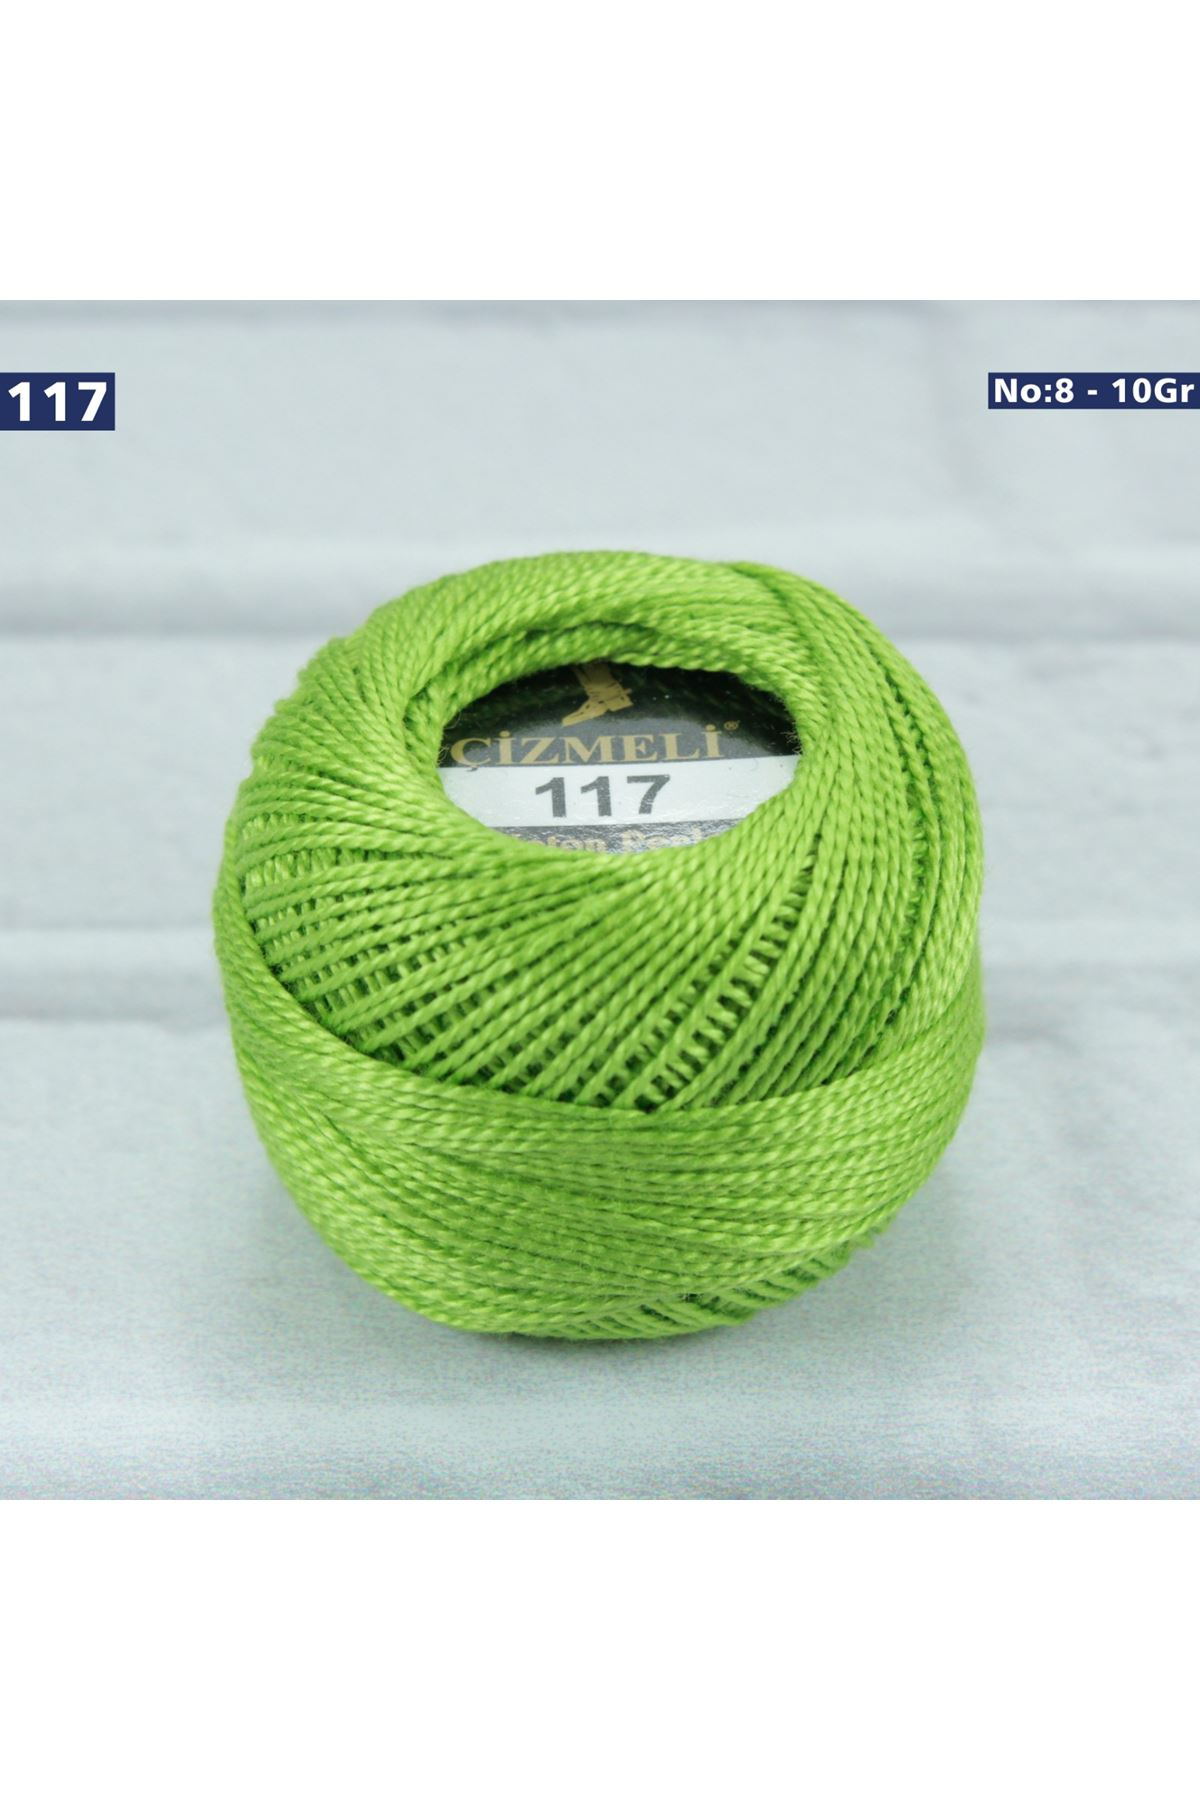 Çizmeli Cotton Perle Nakış İpliği No: 117